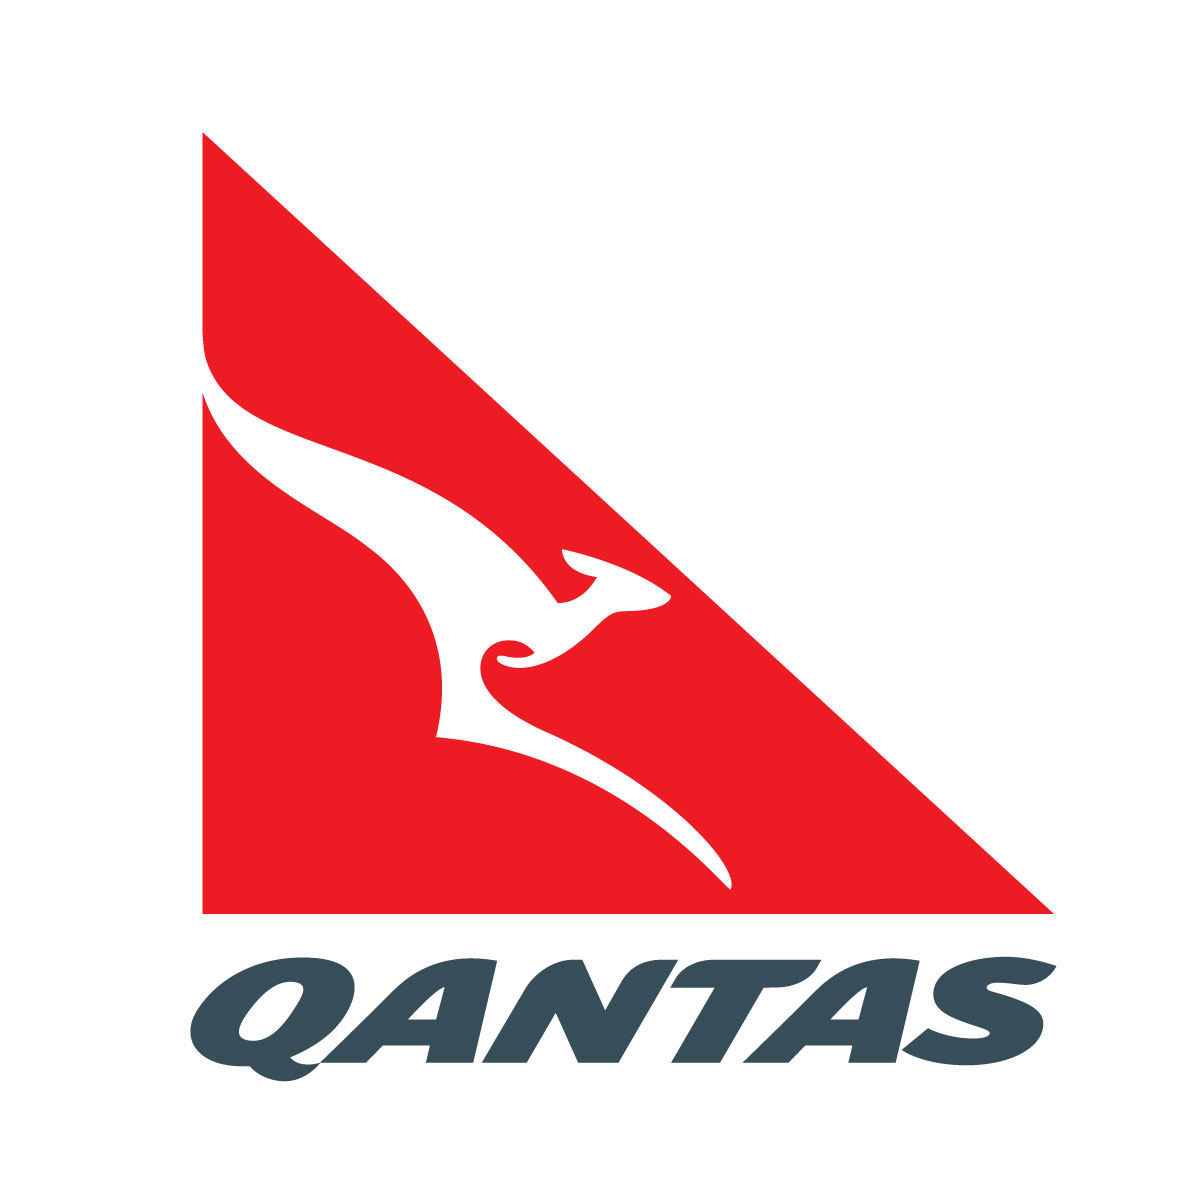 White with Red Triangle Kangaroo Logo - LogoDix